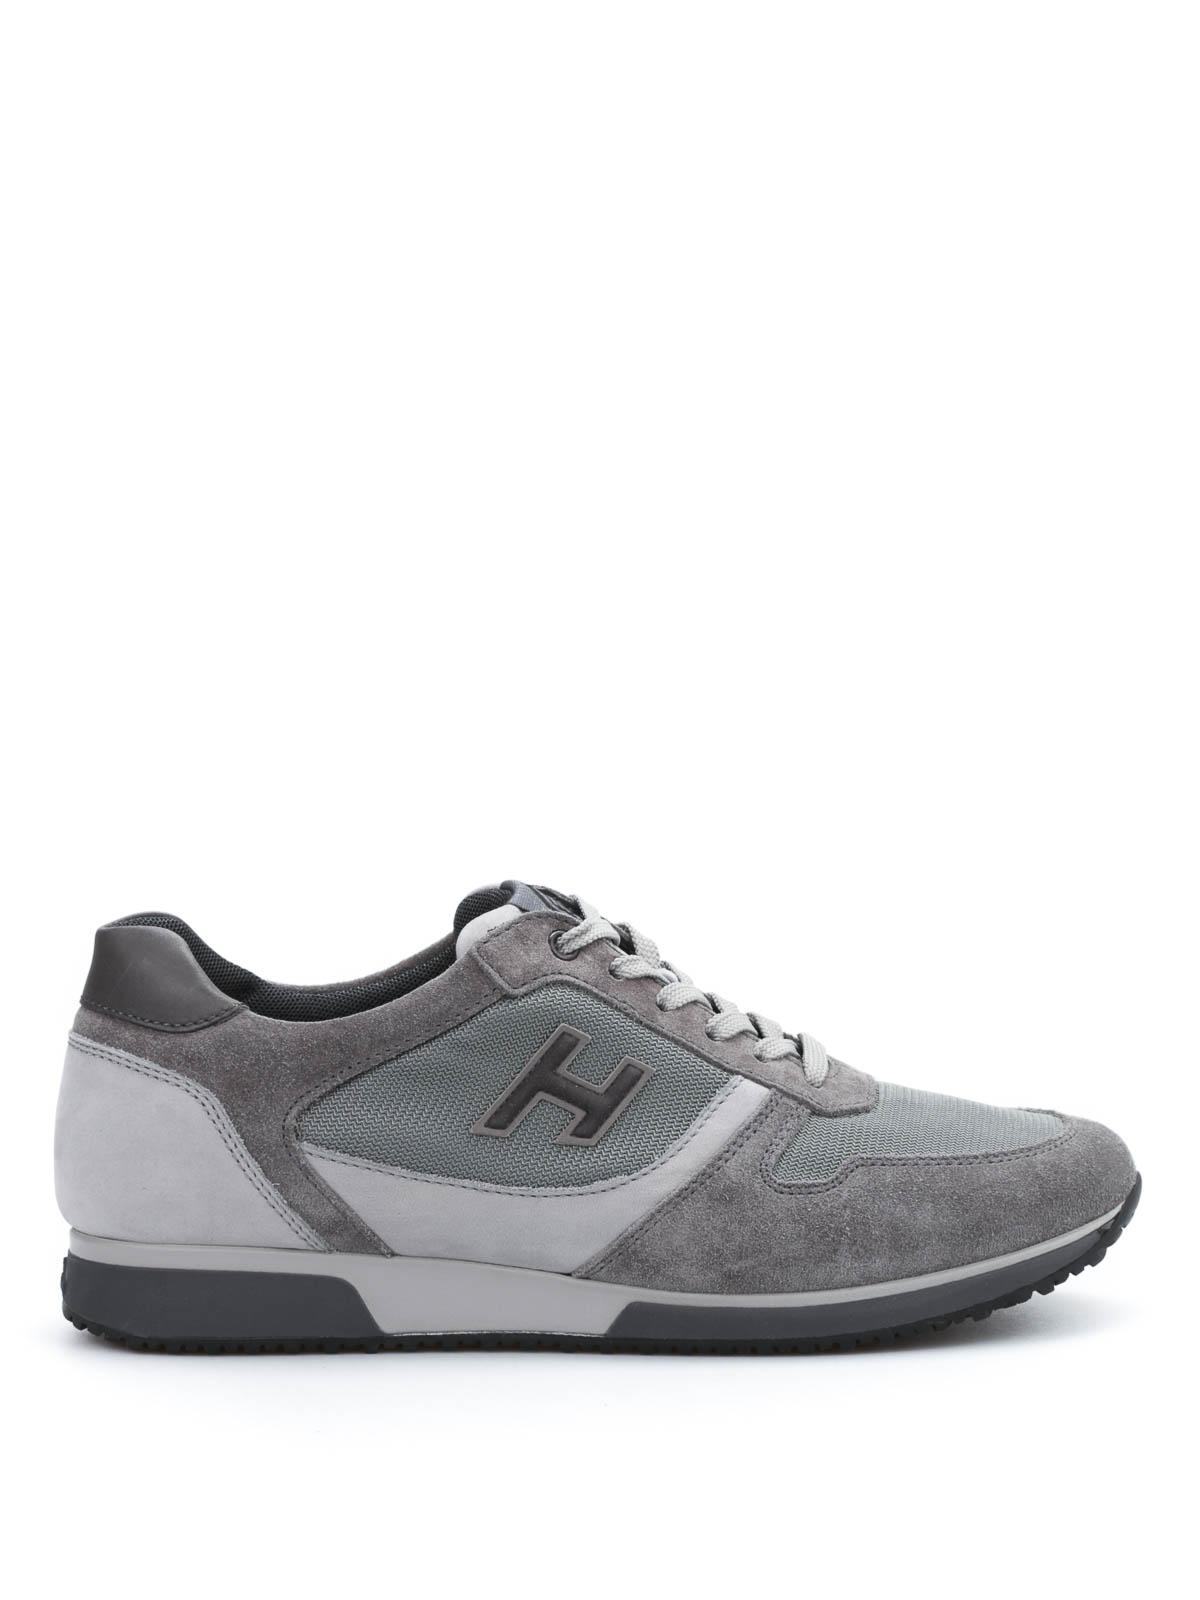 Hogan - H198 Slash H Flock sneakers - trainers - HXM1980R9709E7681S